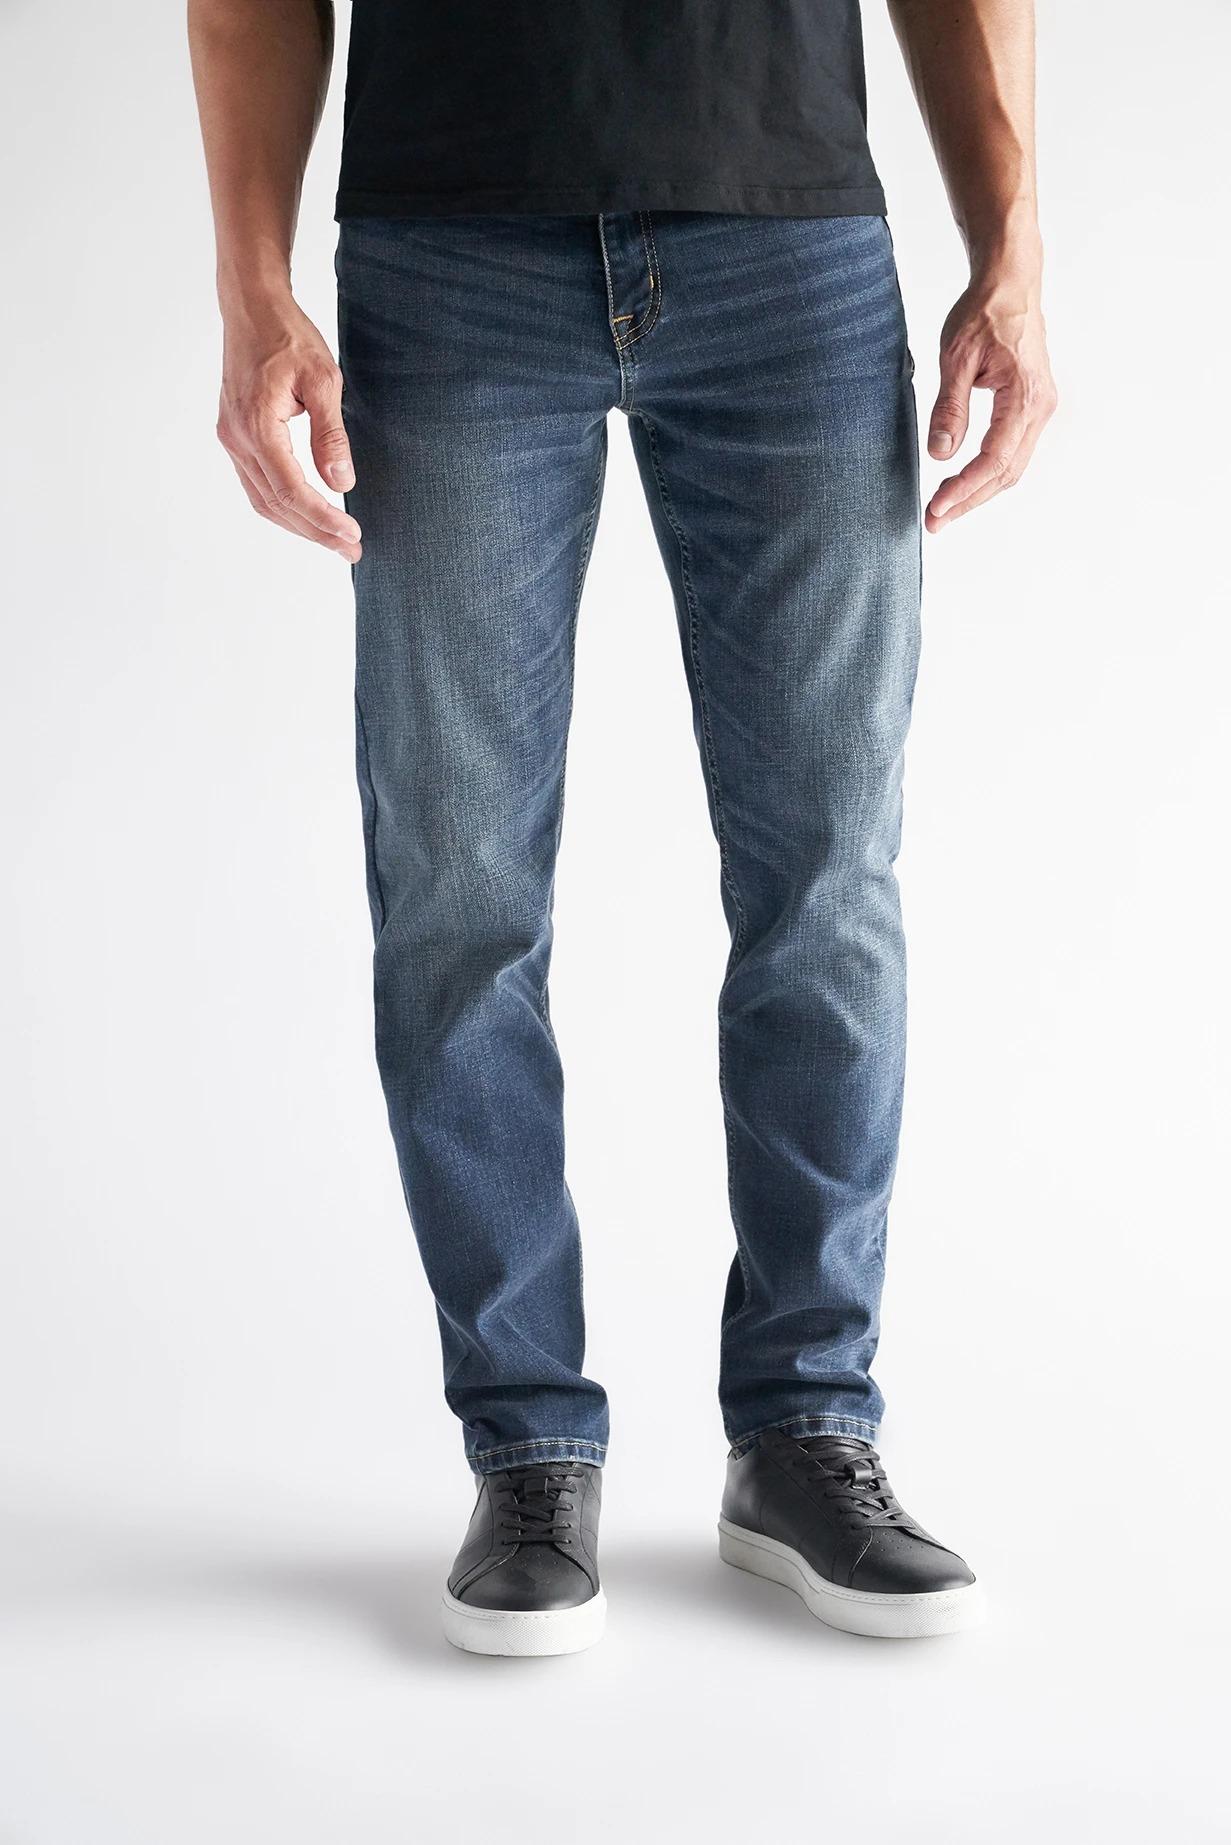 Devil-Dog Dungarees Athletic Fit Jeans